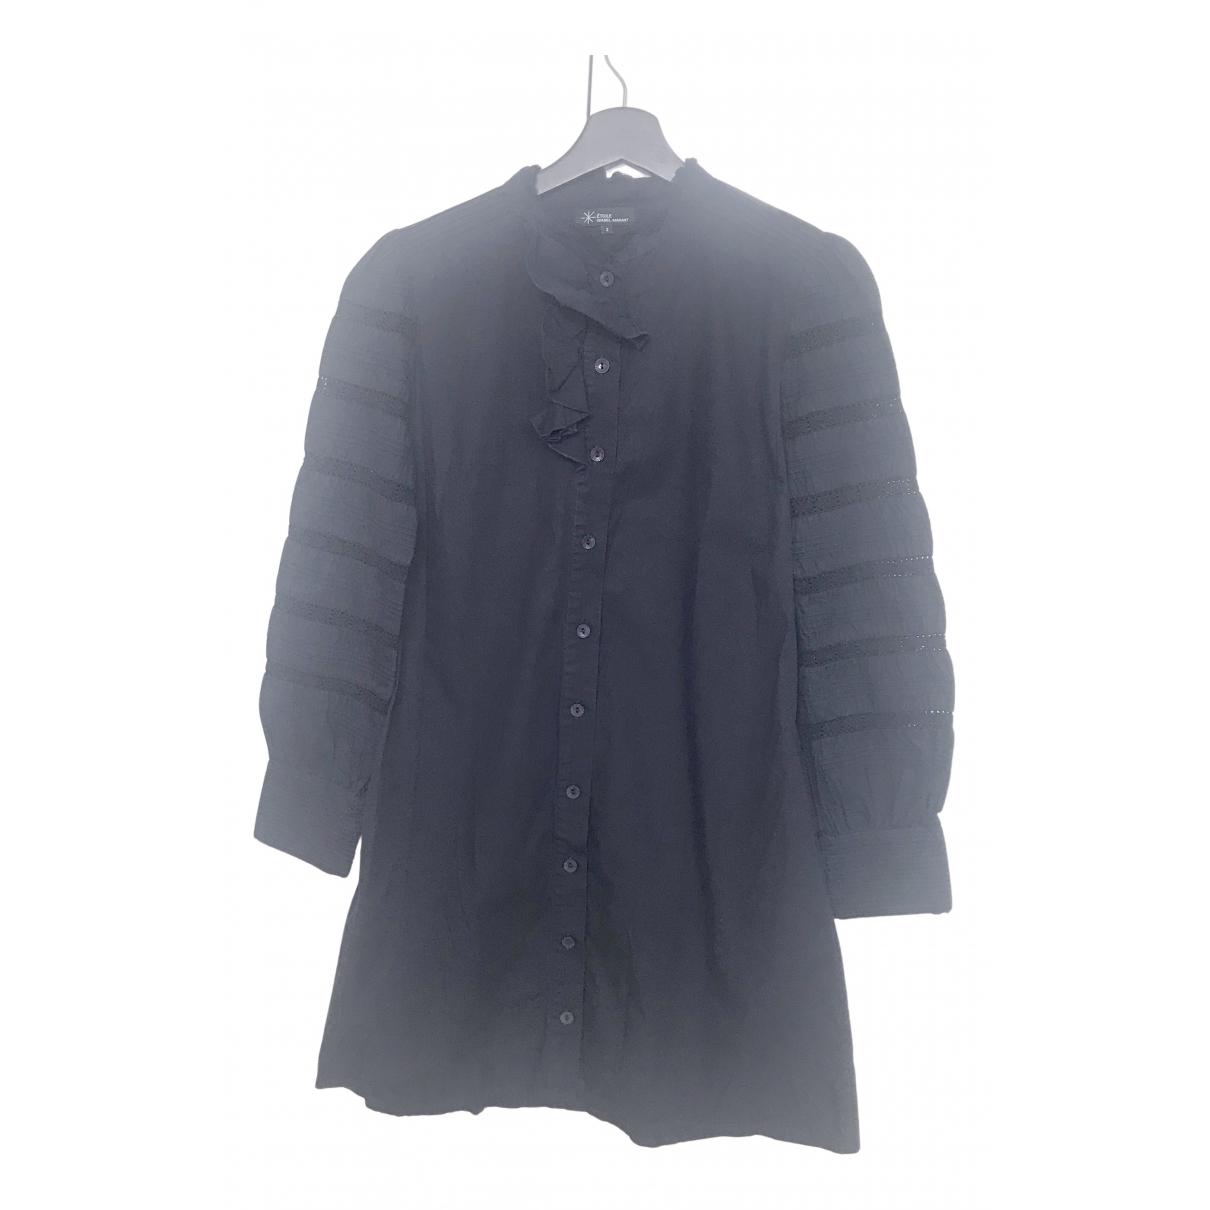 Isabel Marant \N Navy Cotton dress for Women M International